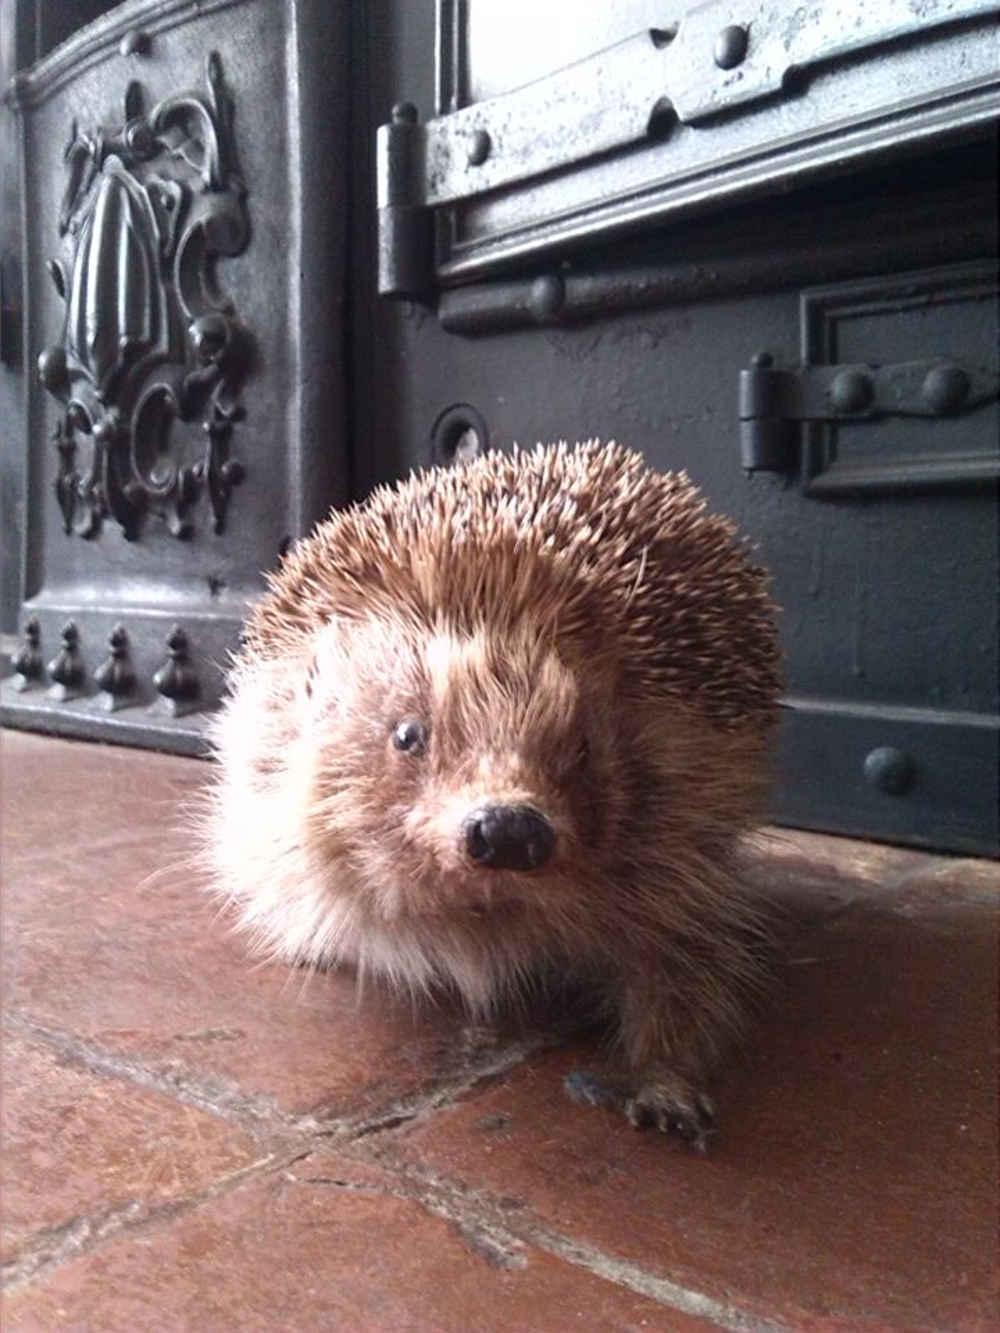 Hedgehog, Bill Spikes